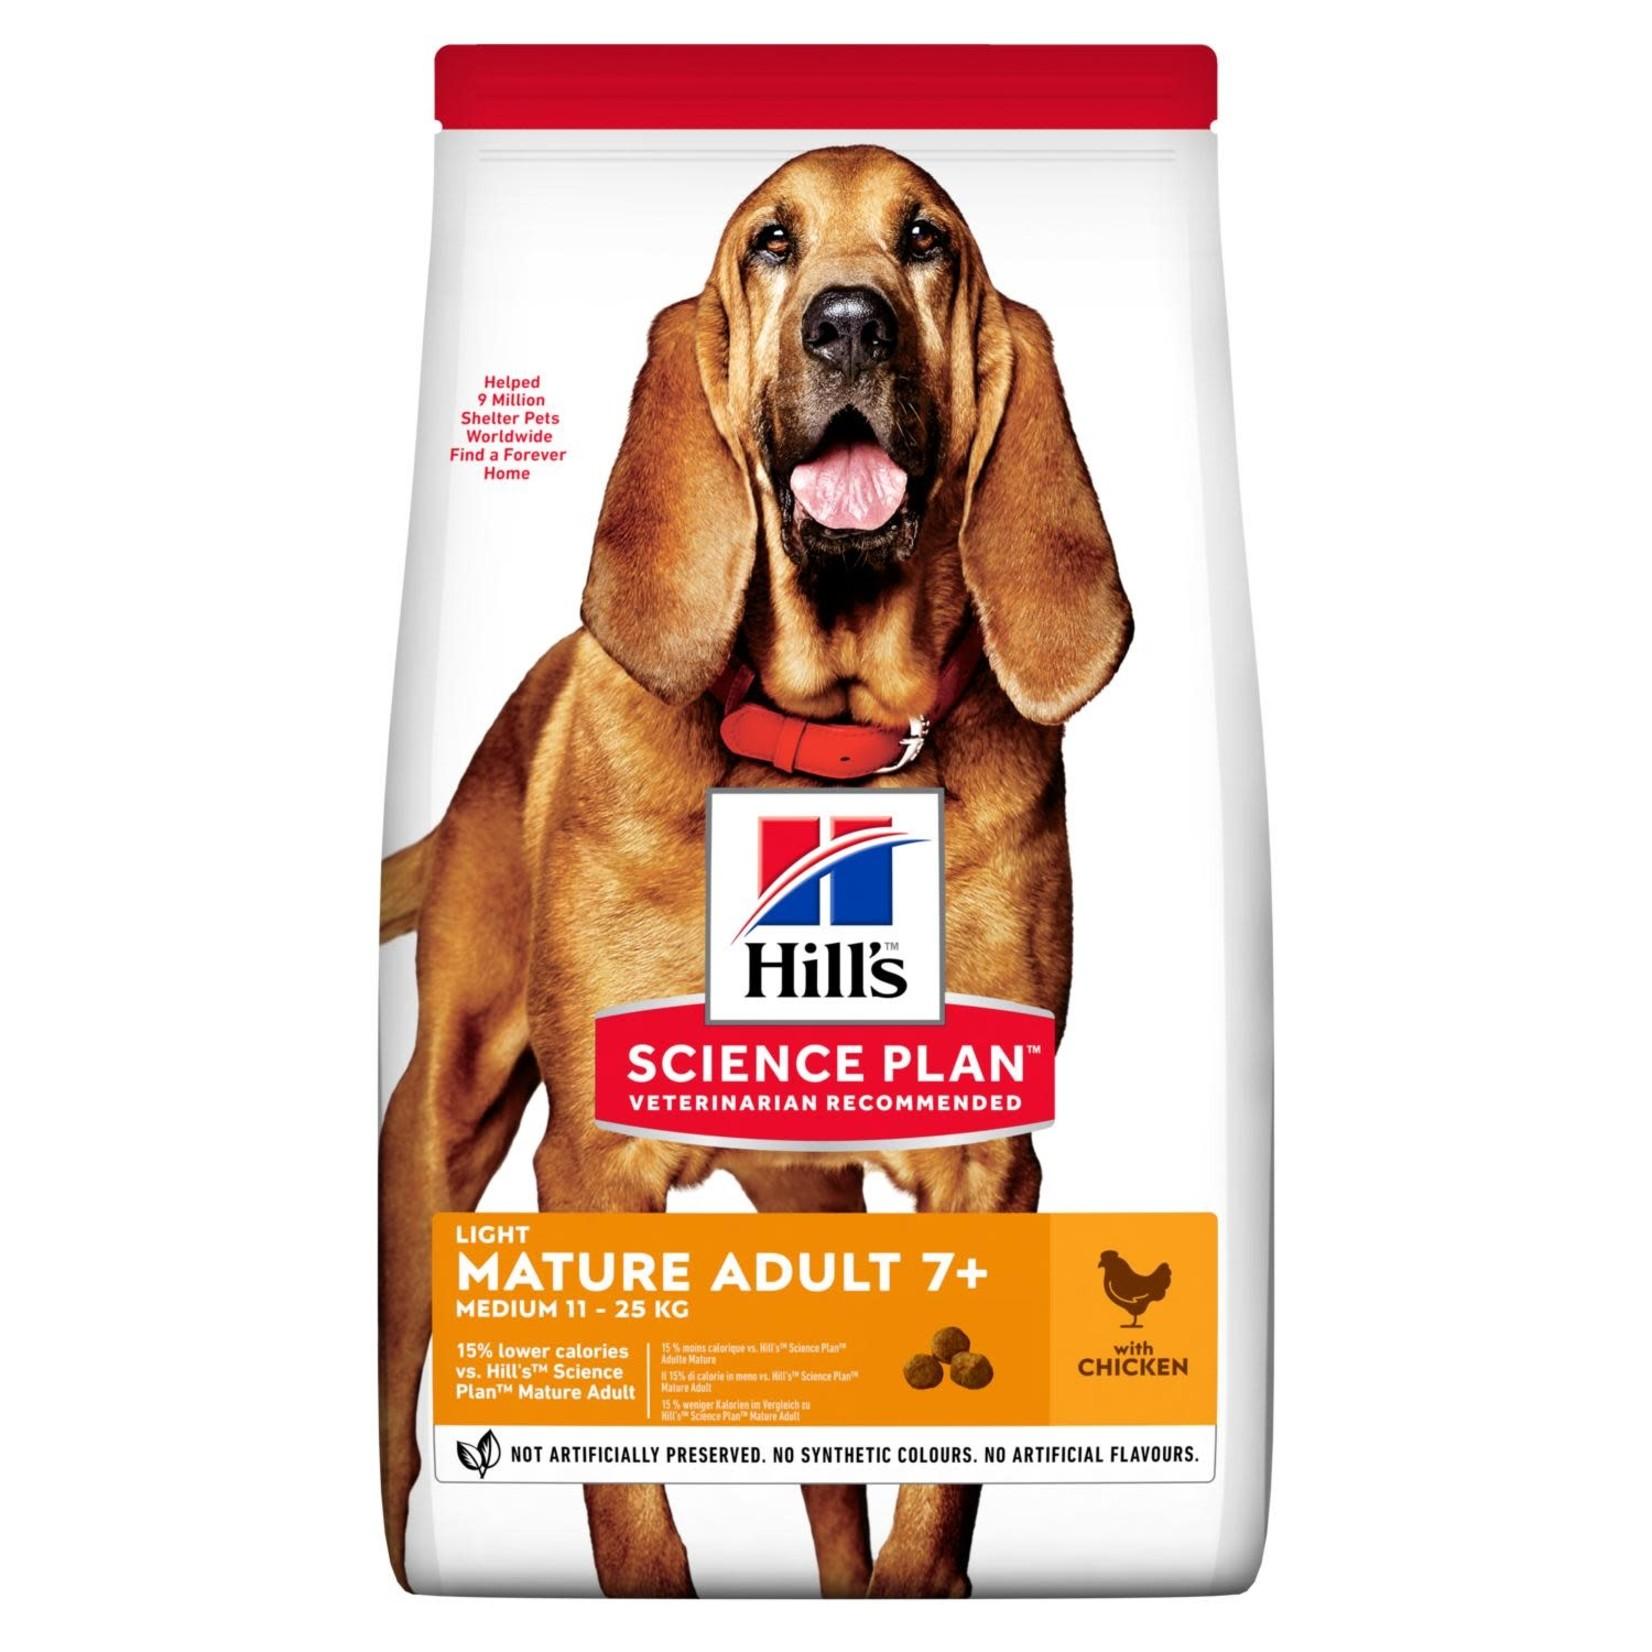 Hill's Science Plan Light Mature Adult 7+ Medium 11-25kg Dog Dry Food, Chicken, 14kg